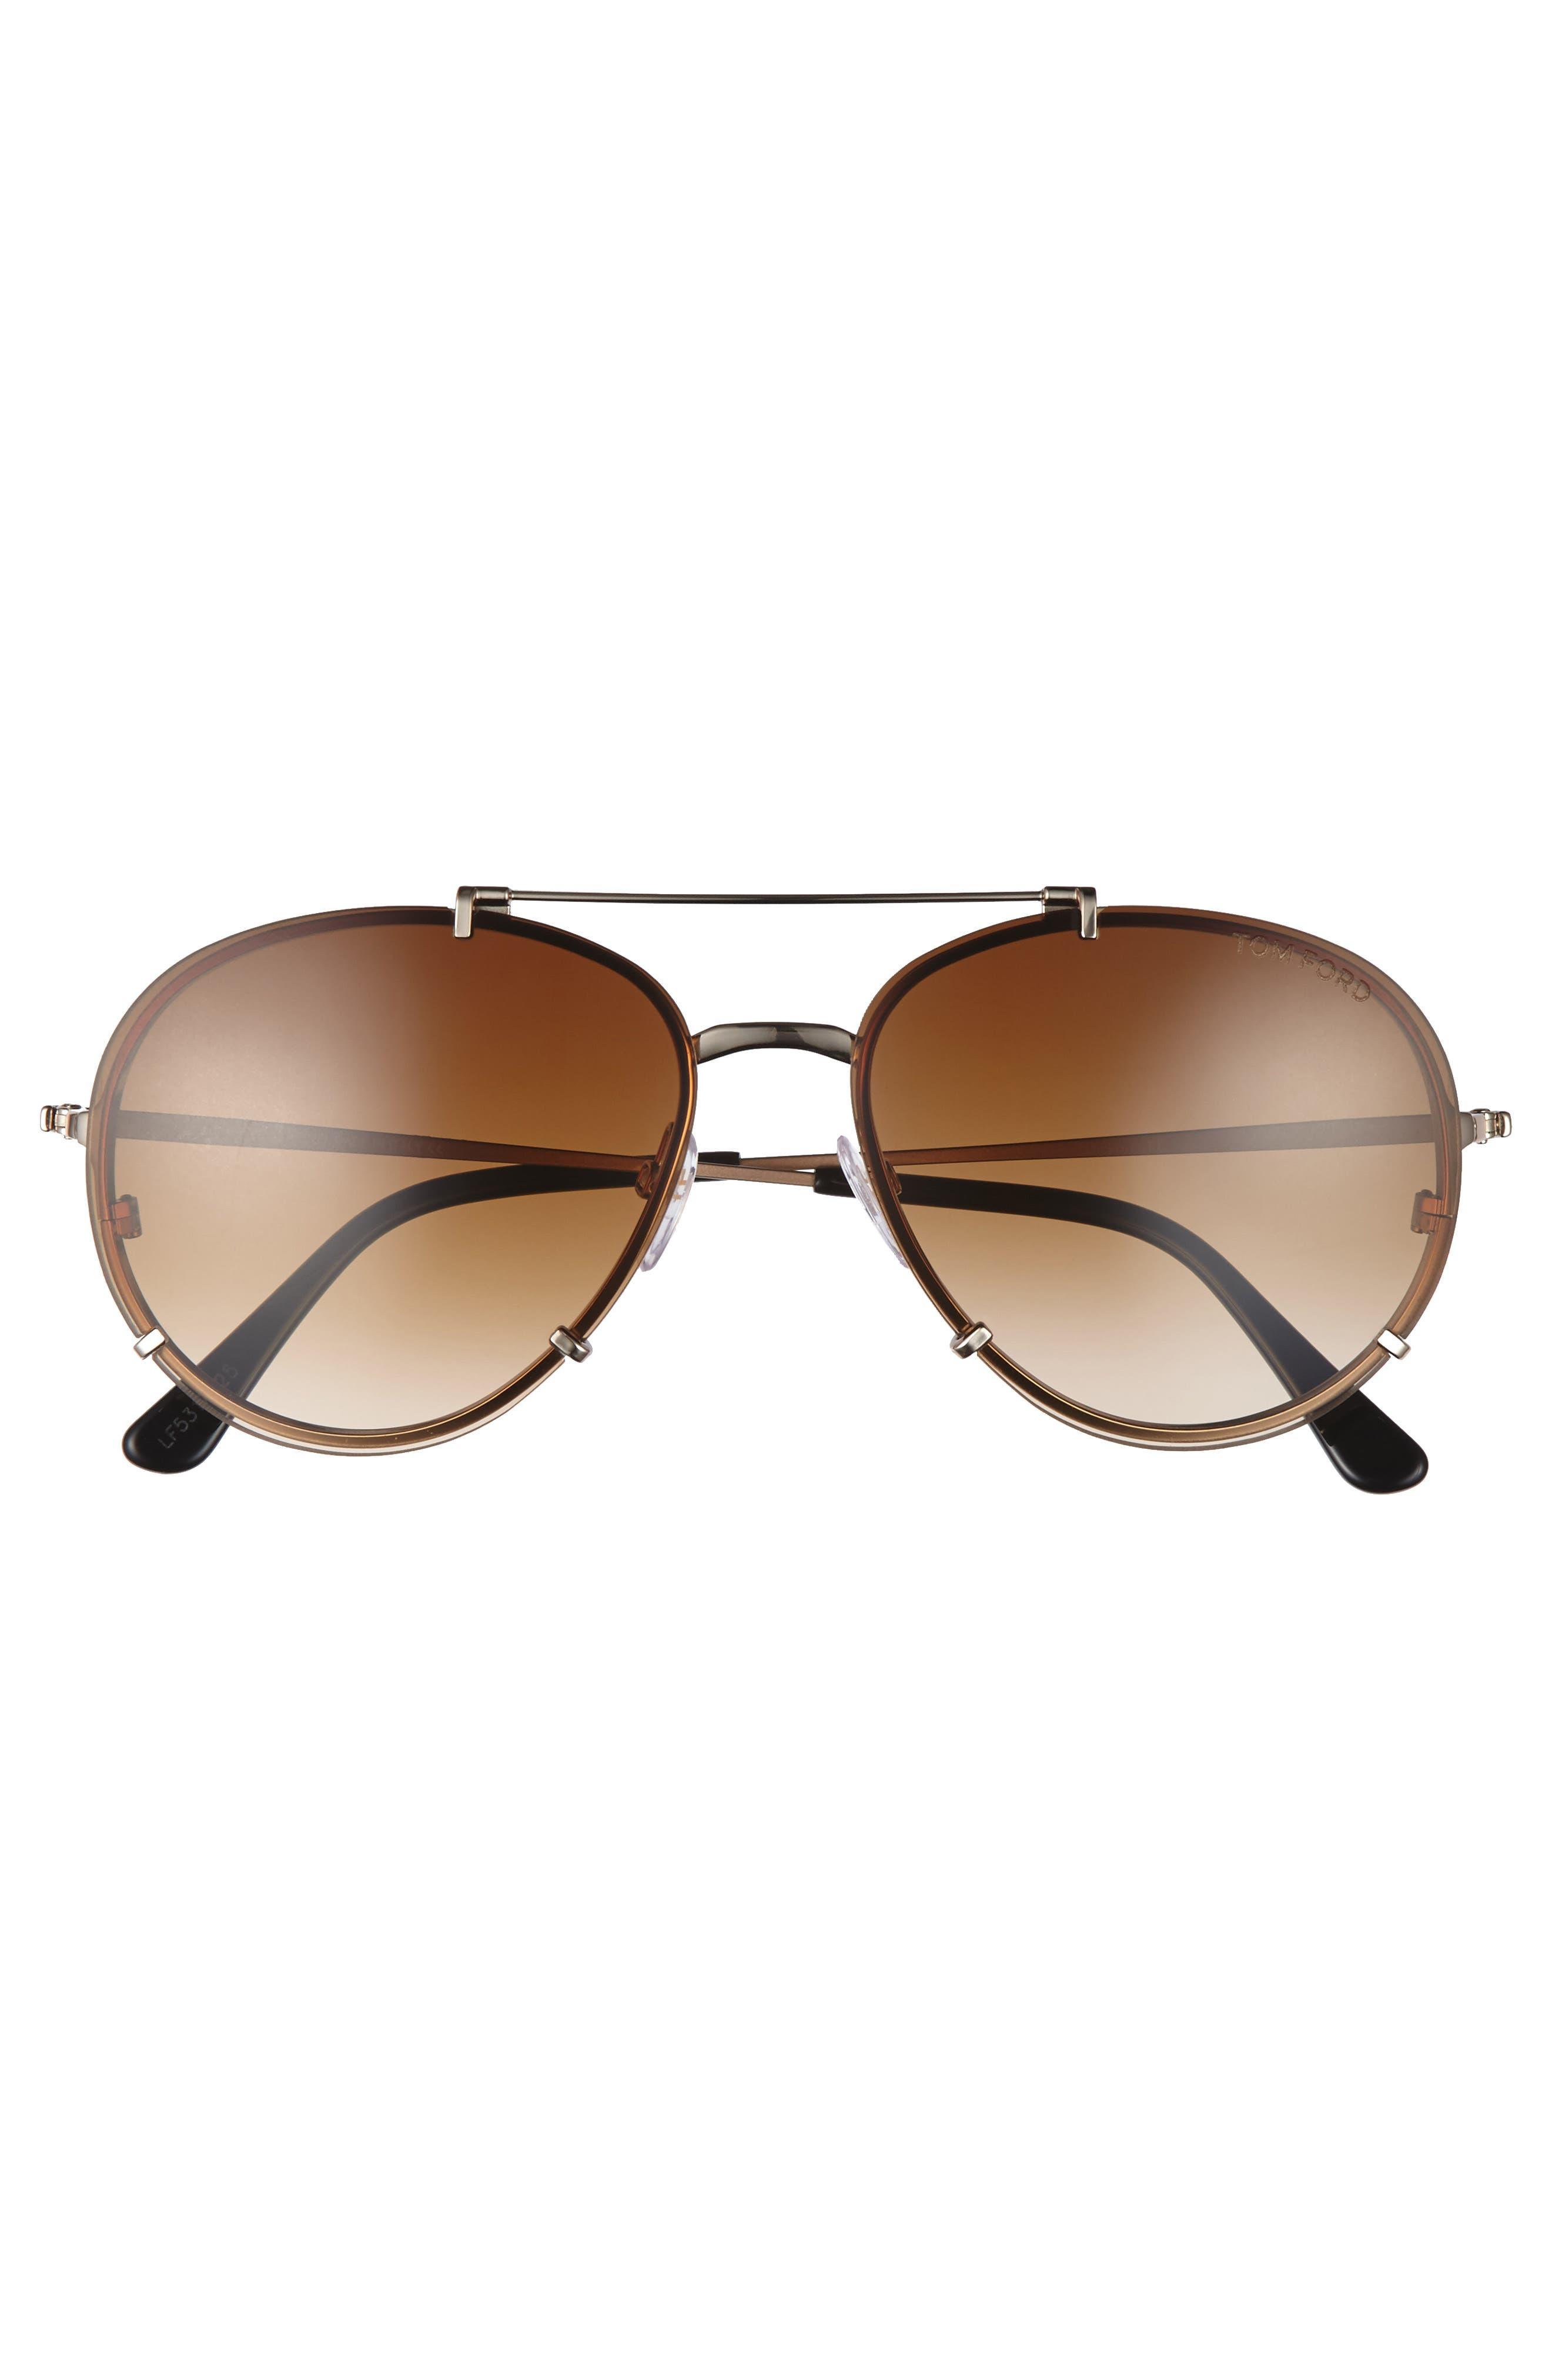 Dickon 59mm Aviator Sunglasses,                             Alternate thumbnail 2, color,                             710